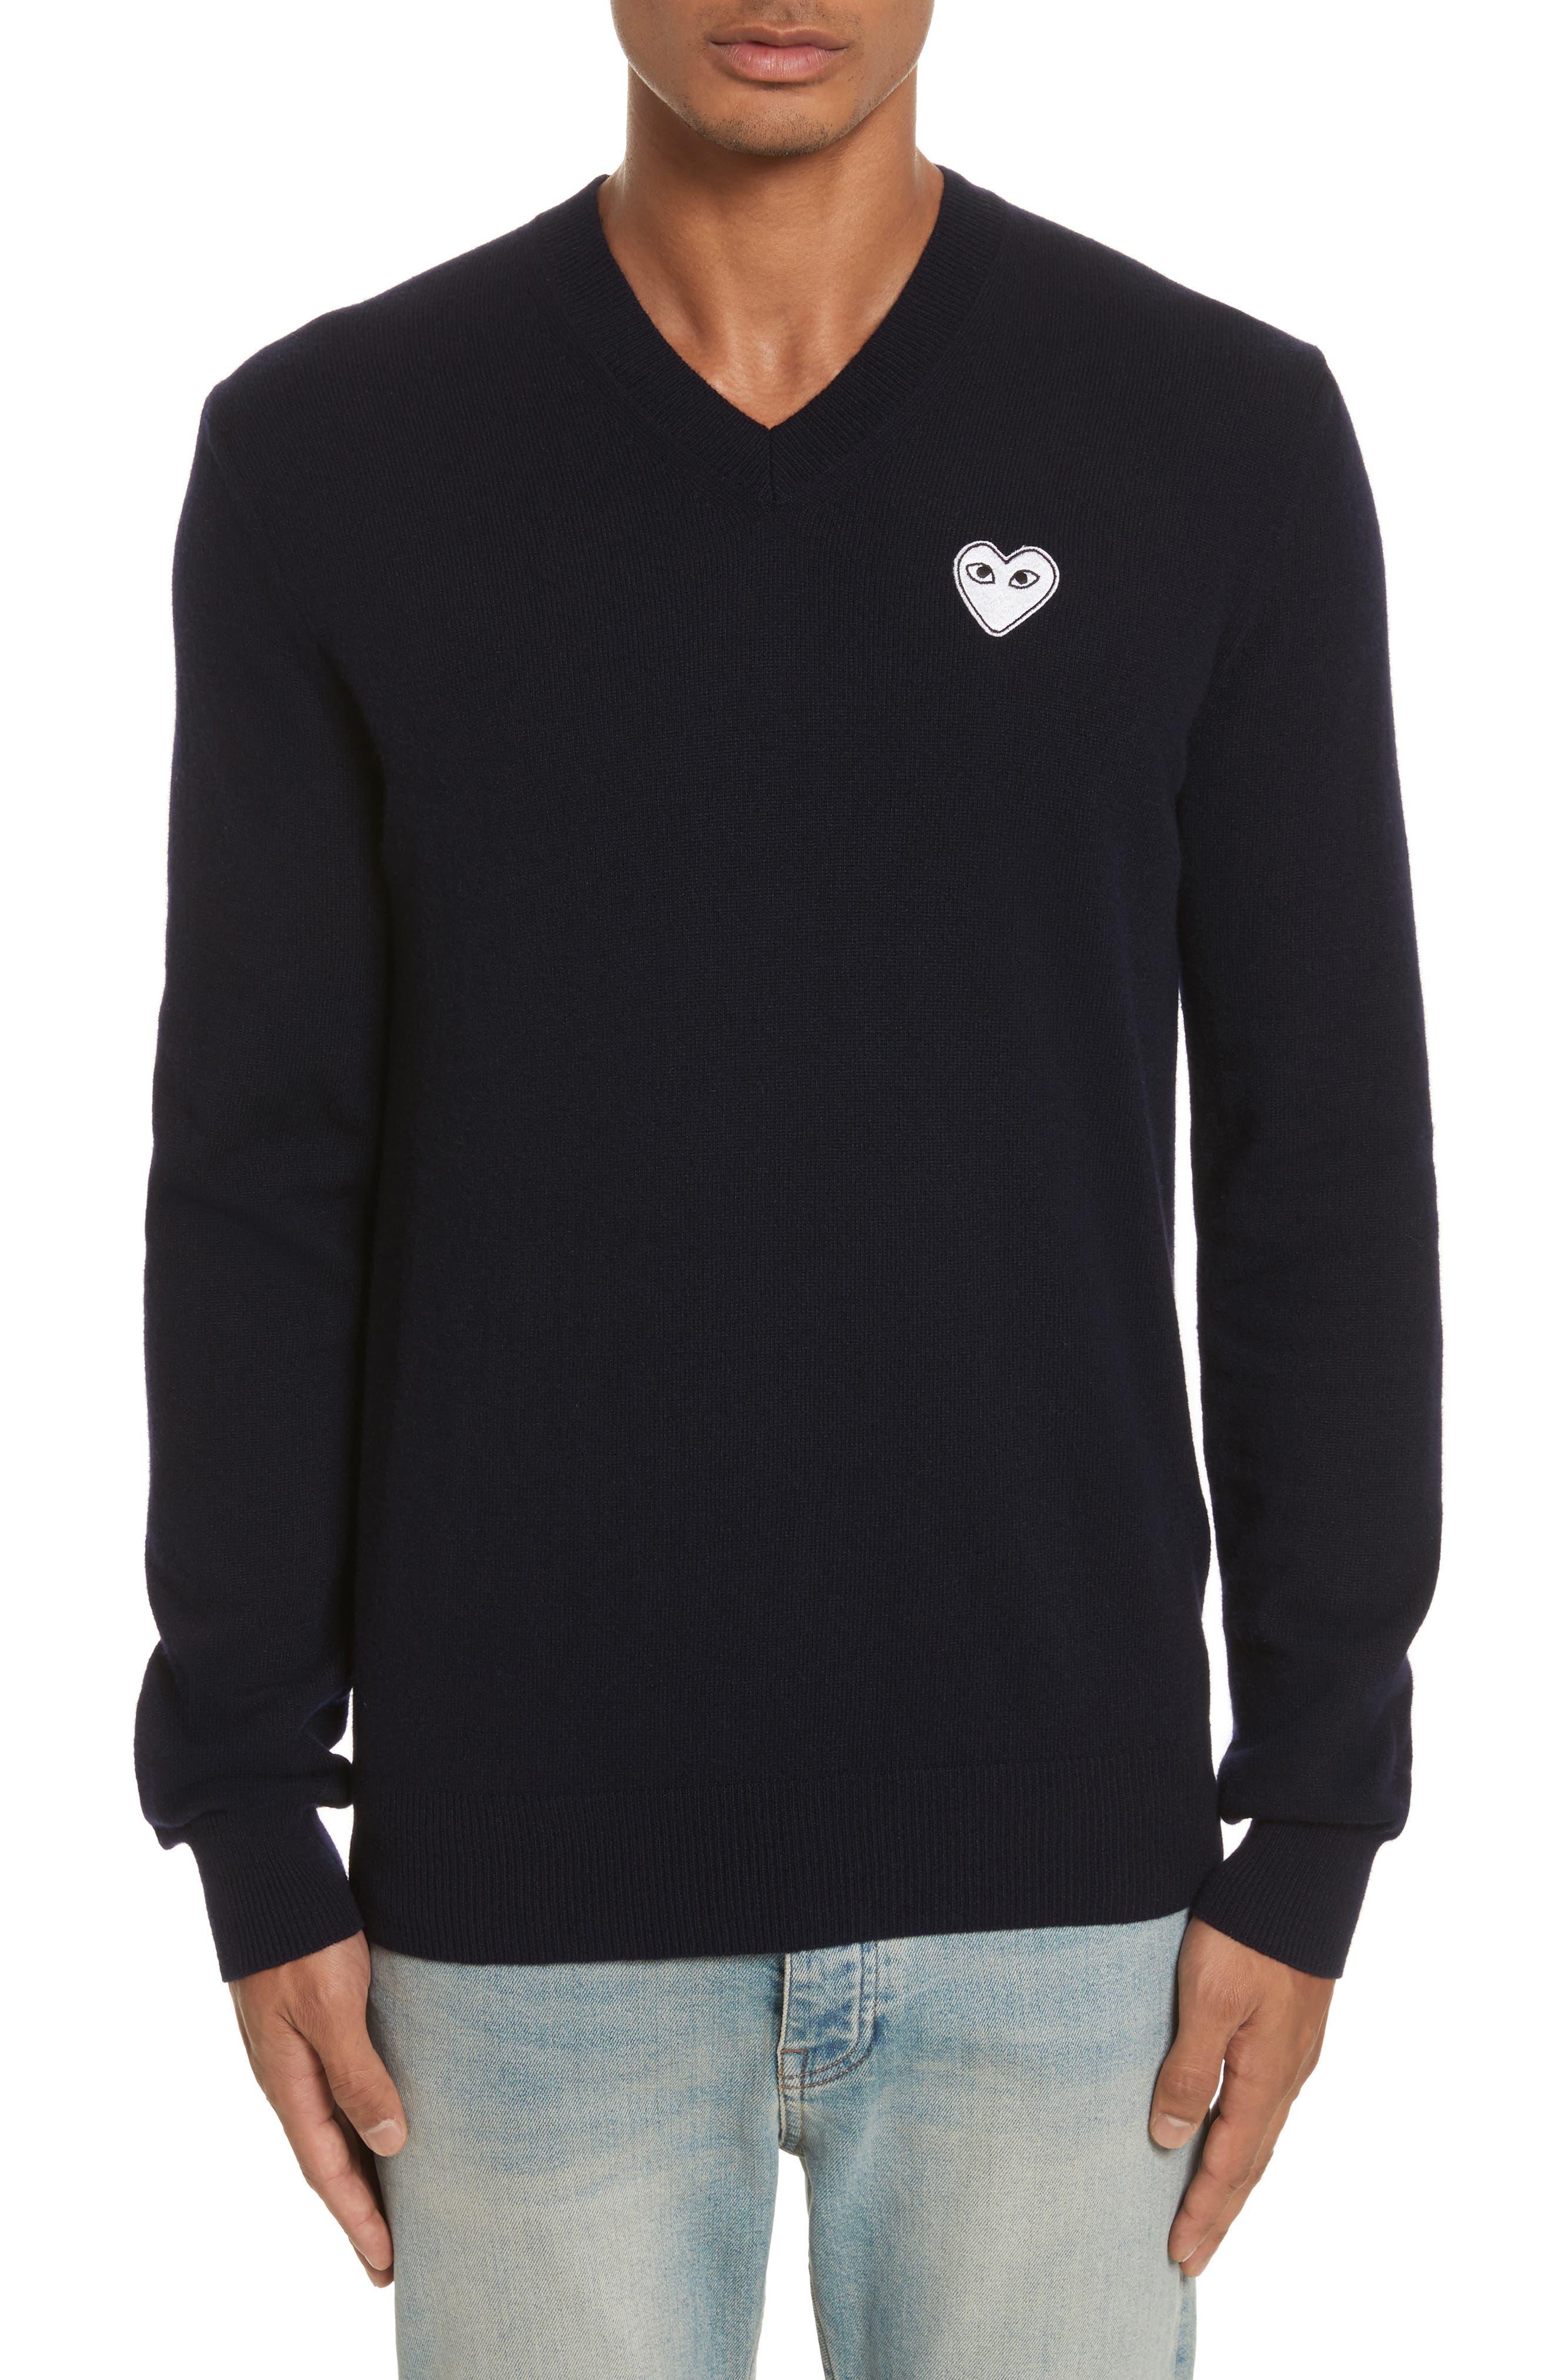 Comme des Garçons PLAY White Heart Wool V-Neck Sweater